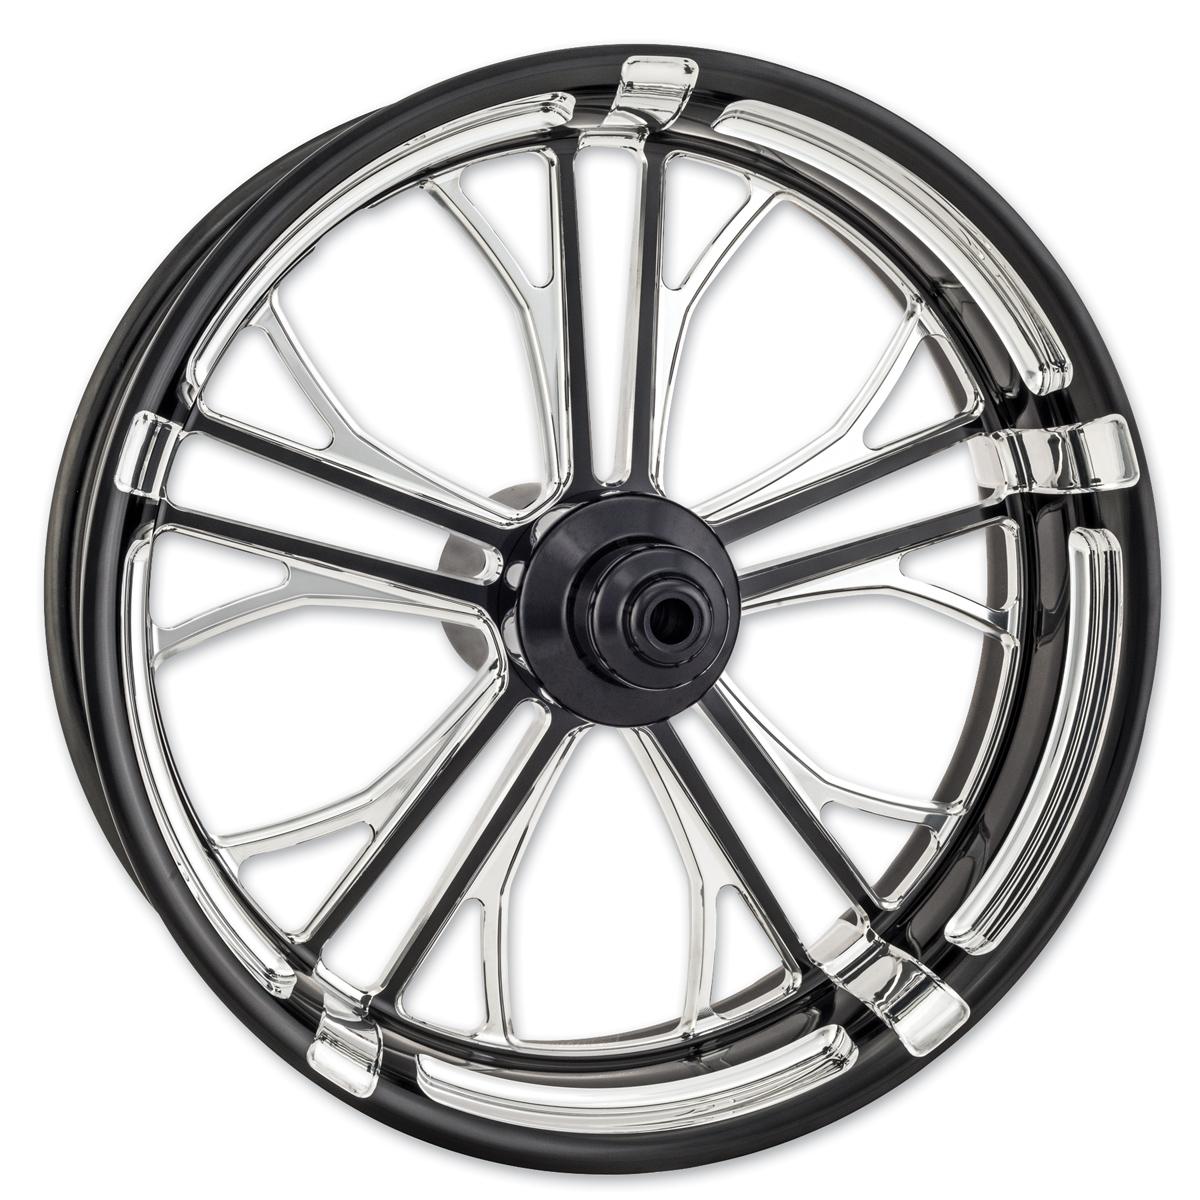 Performance Machine Dixon Platinum Cut Front Wheel 21x2.15 With PM Disc